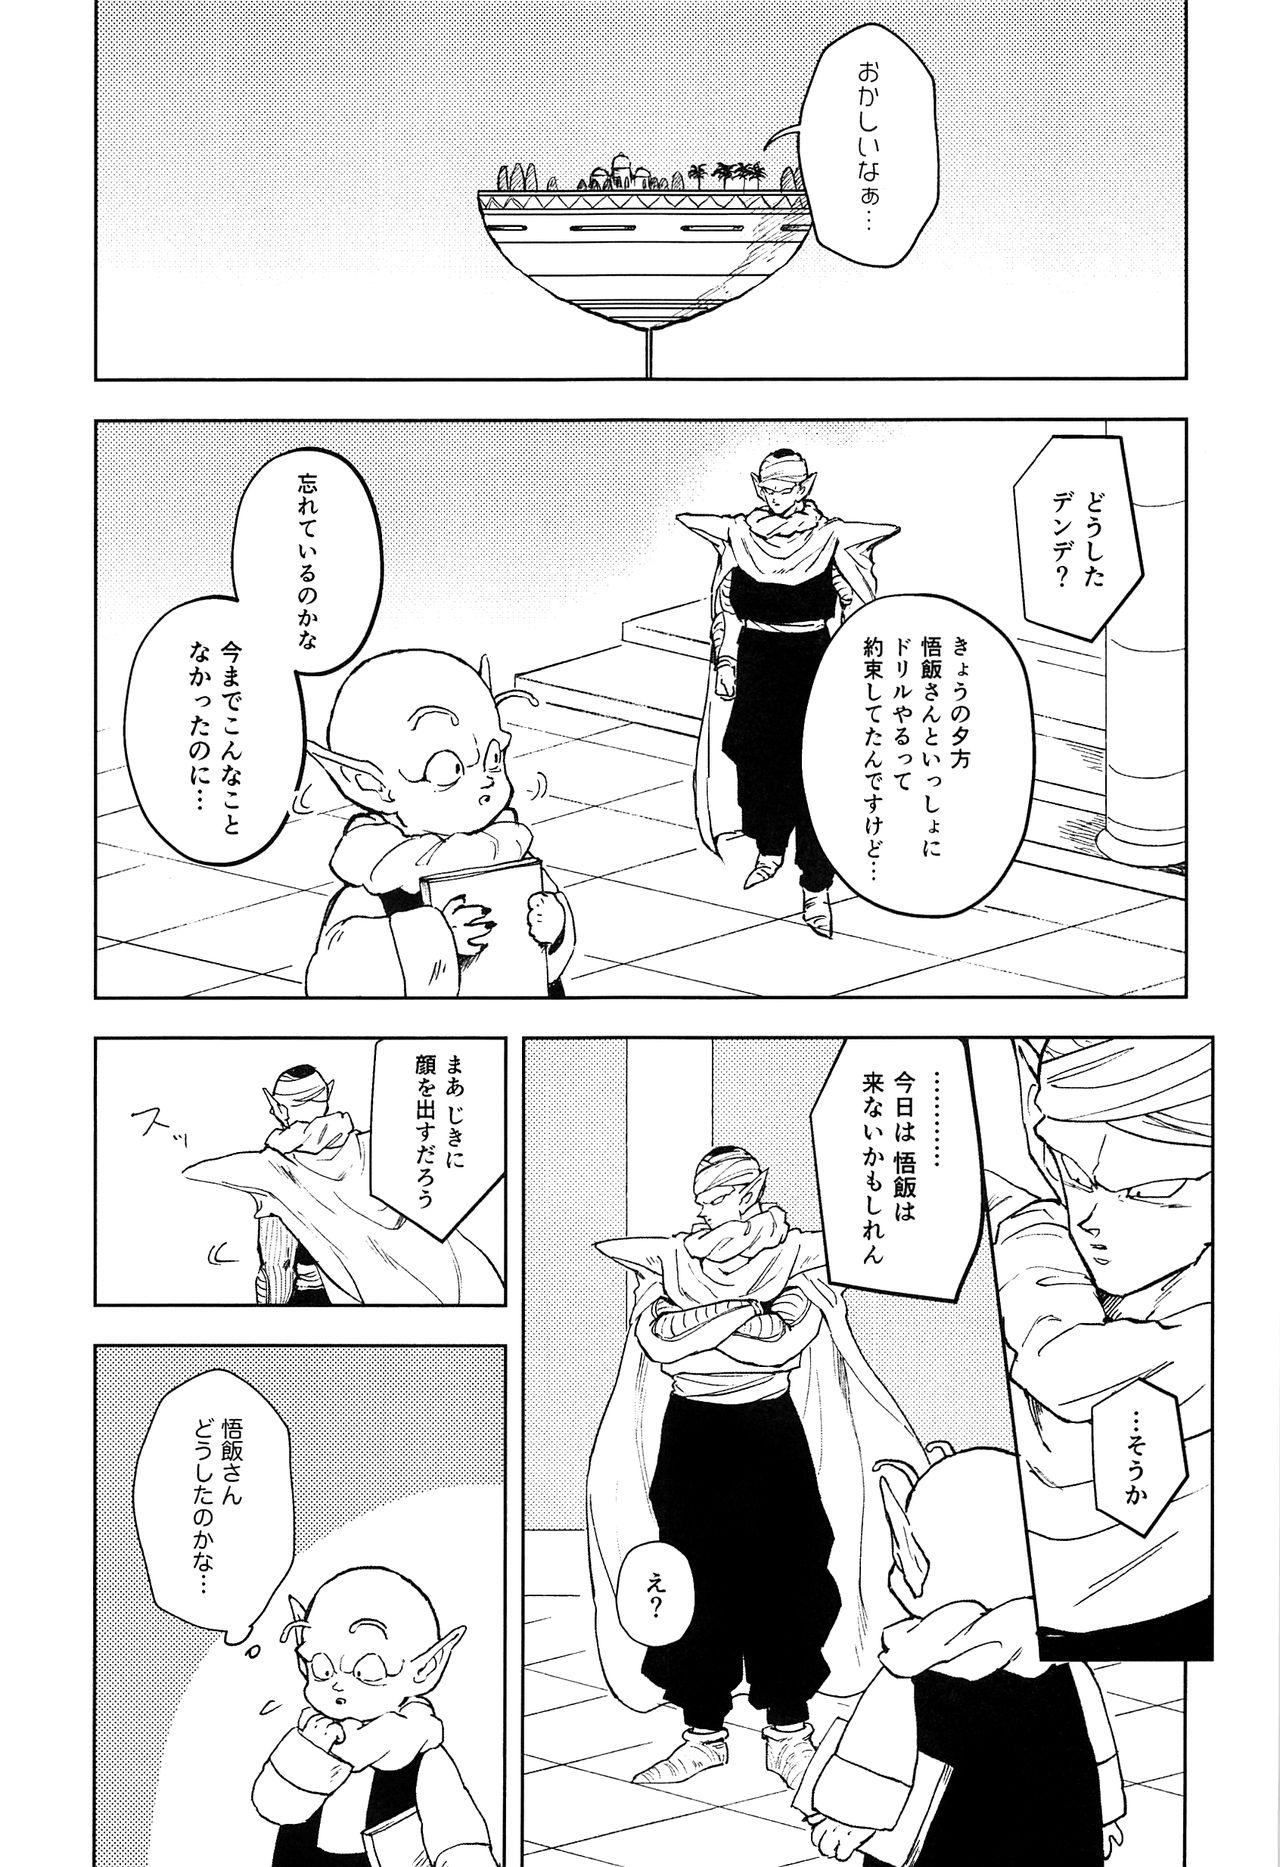 Odorokubeki Zanzou - WONDER BLUR 5